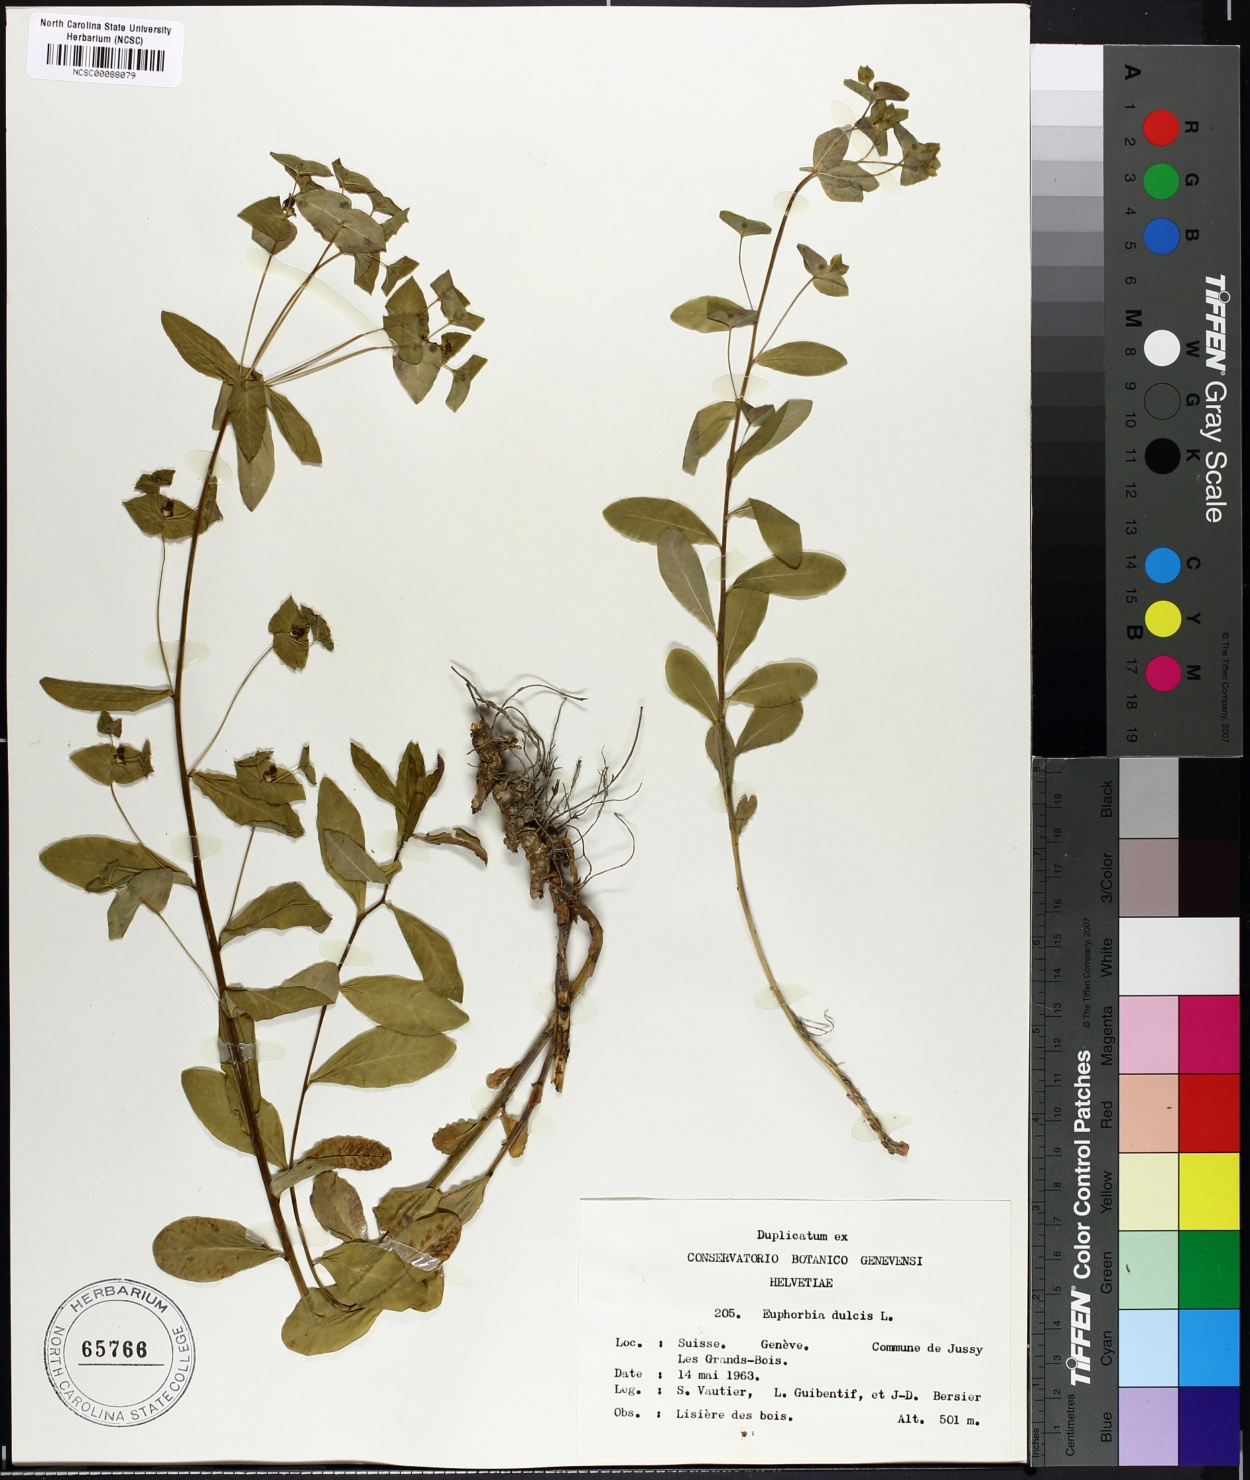 Euphorbia dulcis image